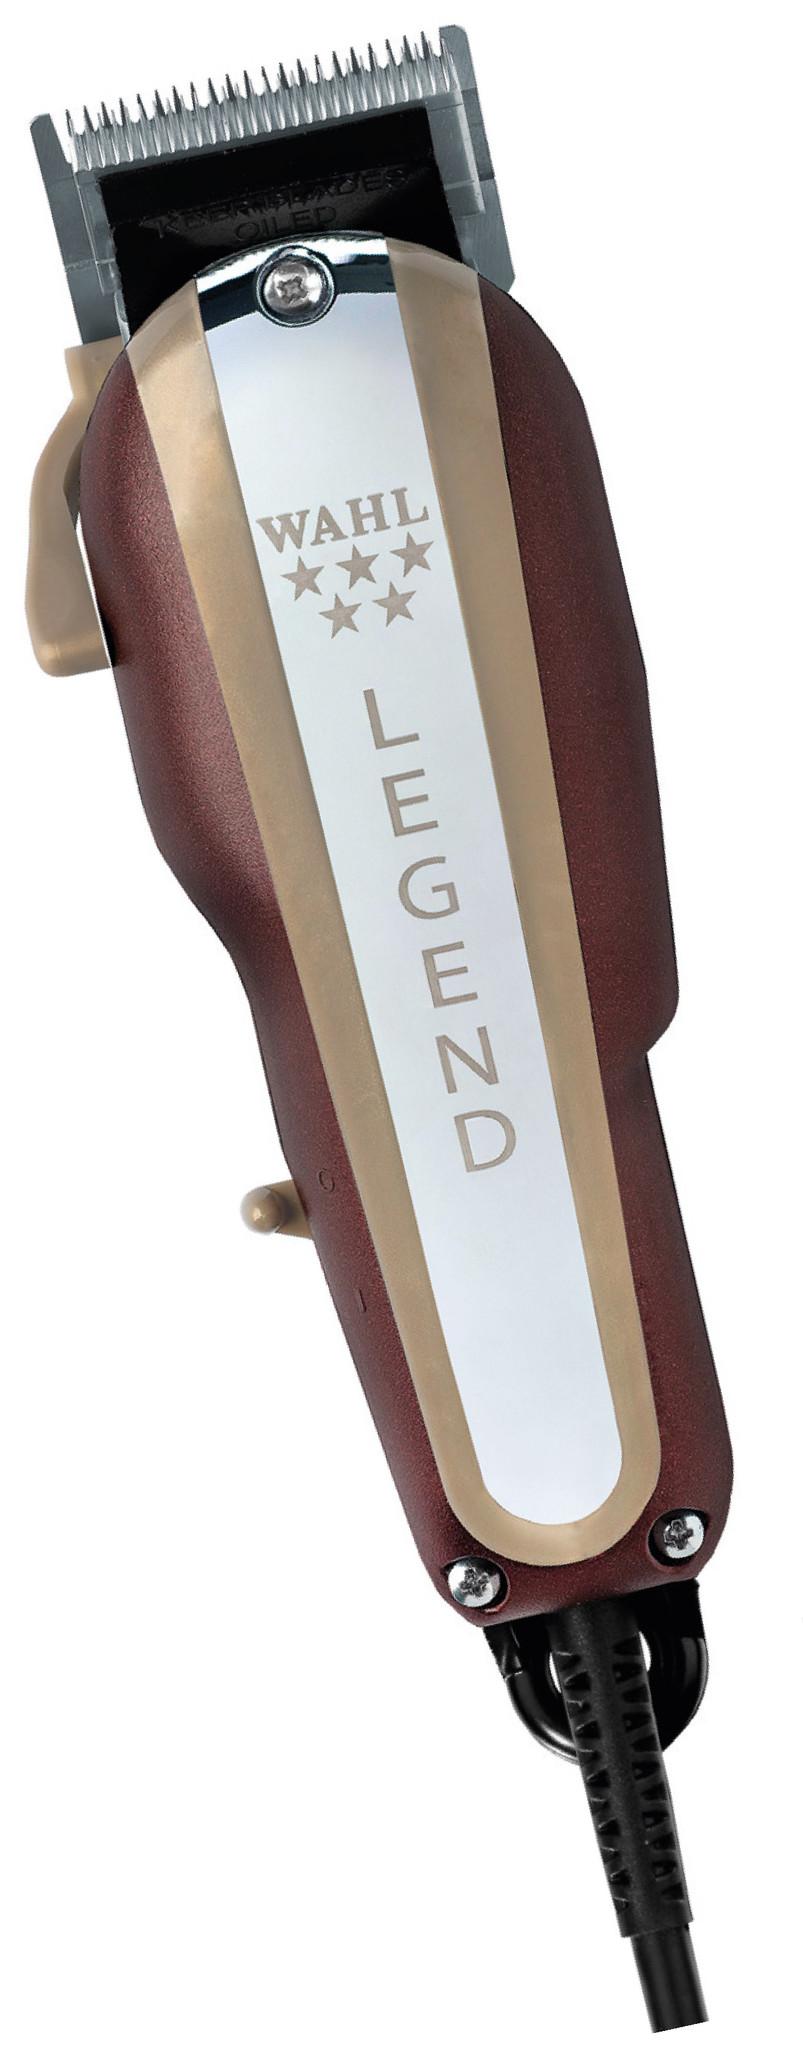 Wahl Legend 08147-416 - profesionálny strihací strojček + Gembird - stlačený vzduch, 400 ml